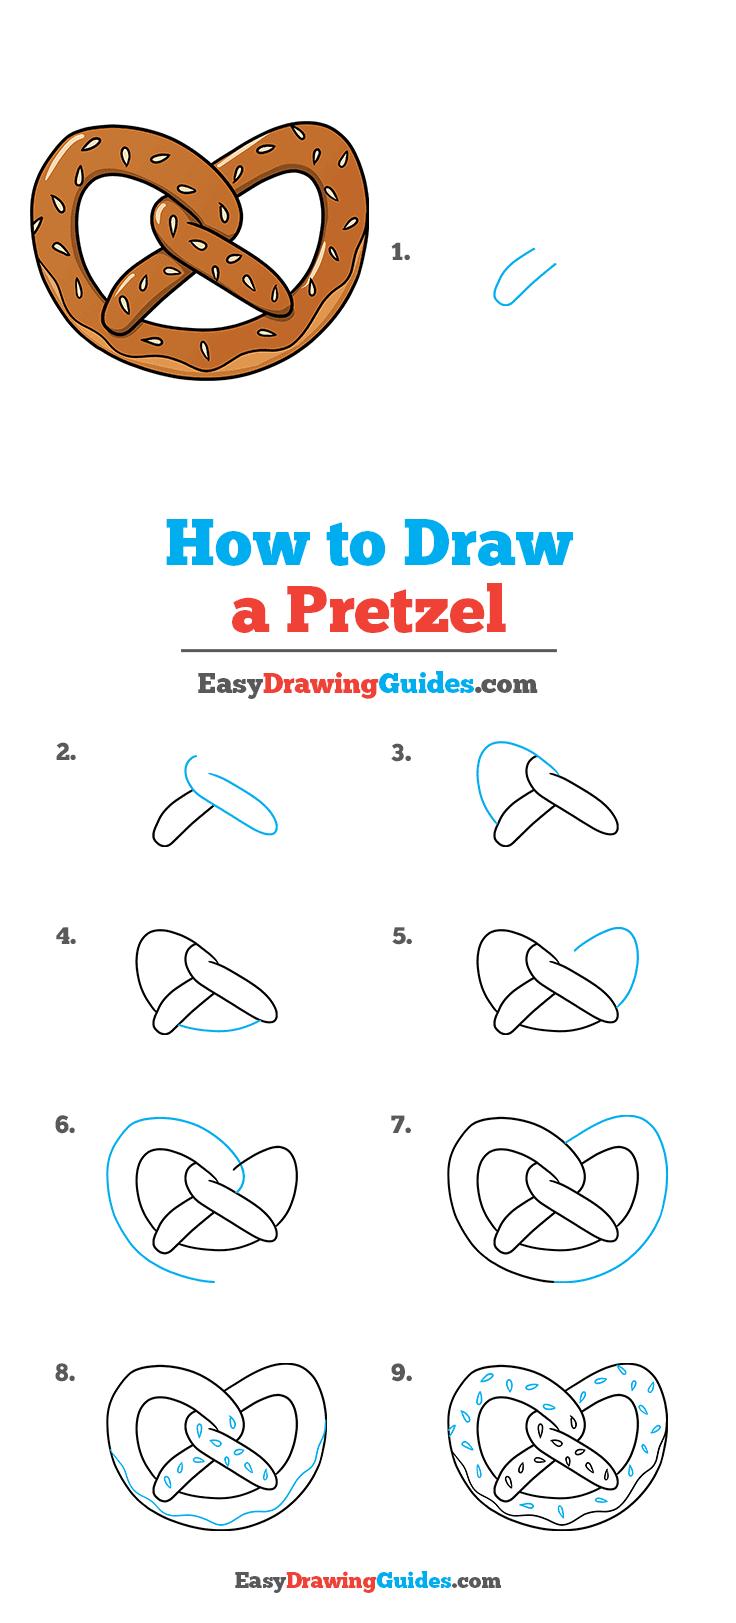 How to Draw a Pretzel Step by Step Tutorial Image